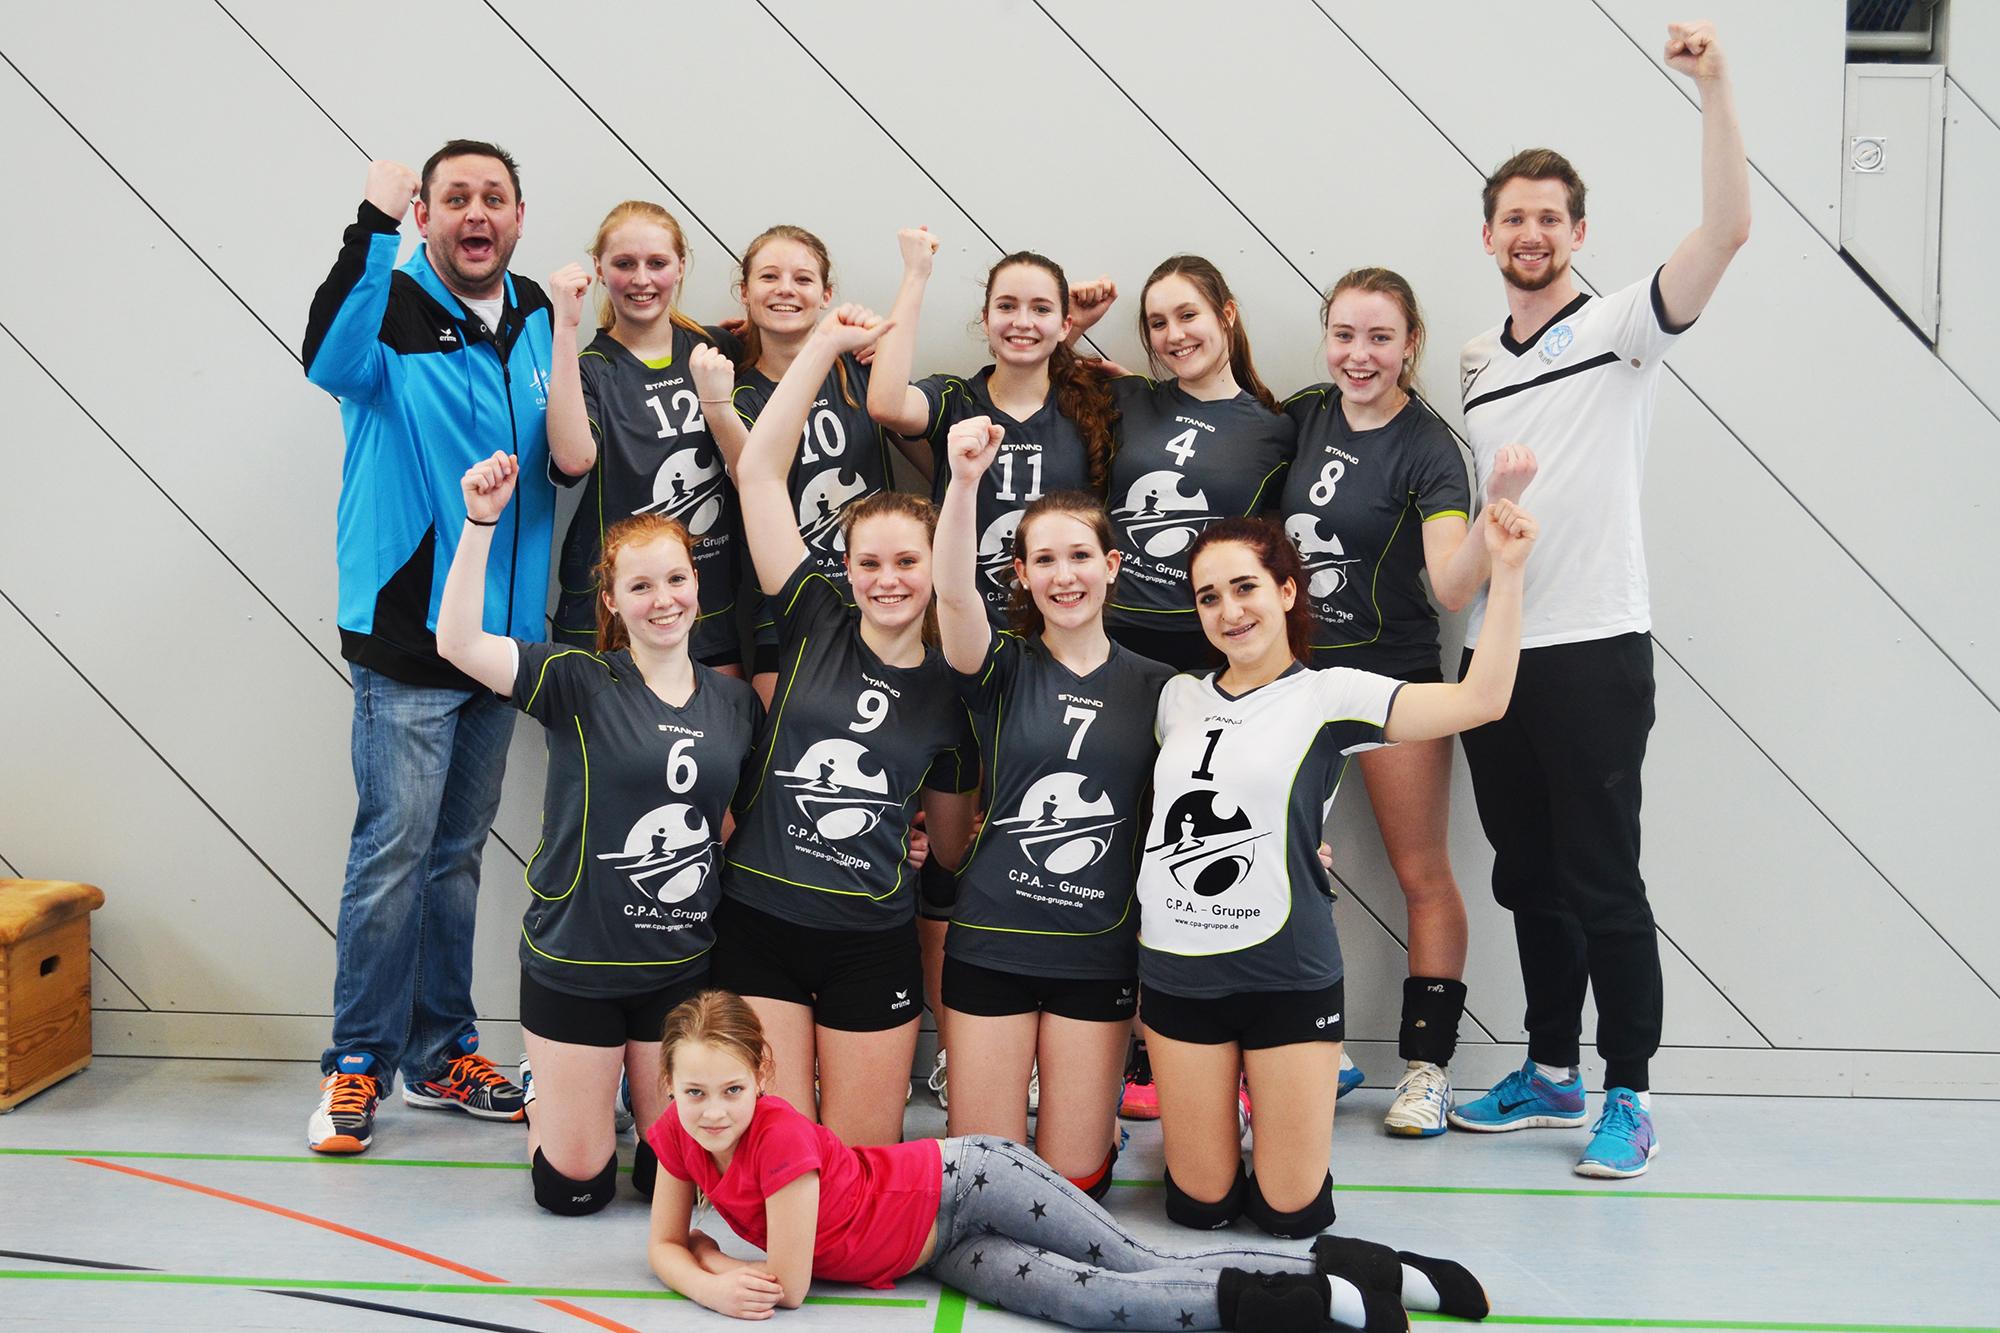 N.H. Young Volleys - Jugend U18